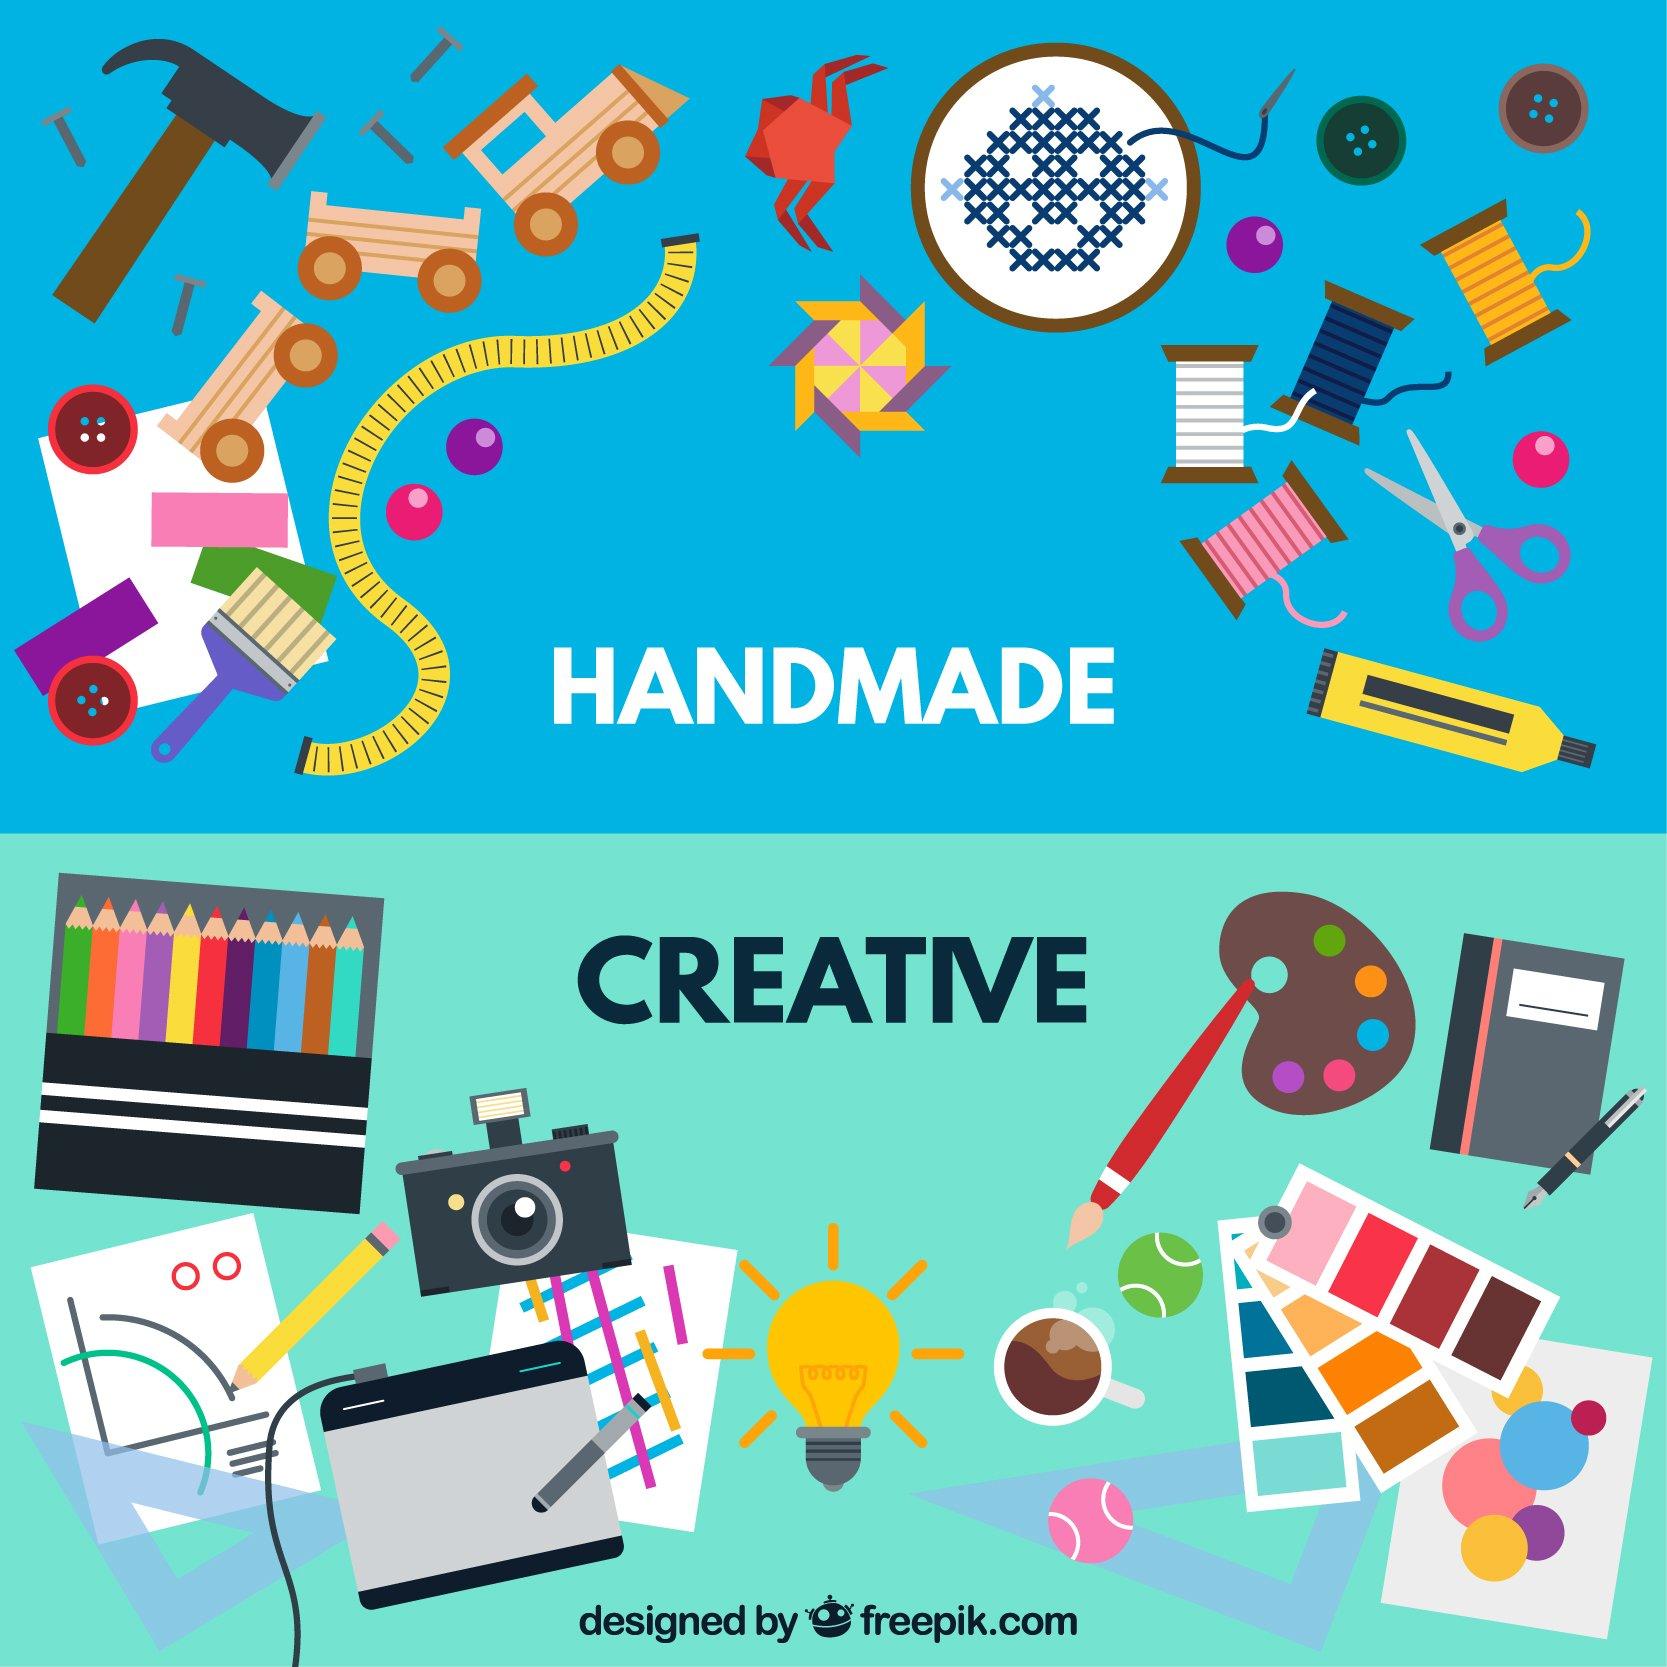 hand_creative-2